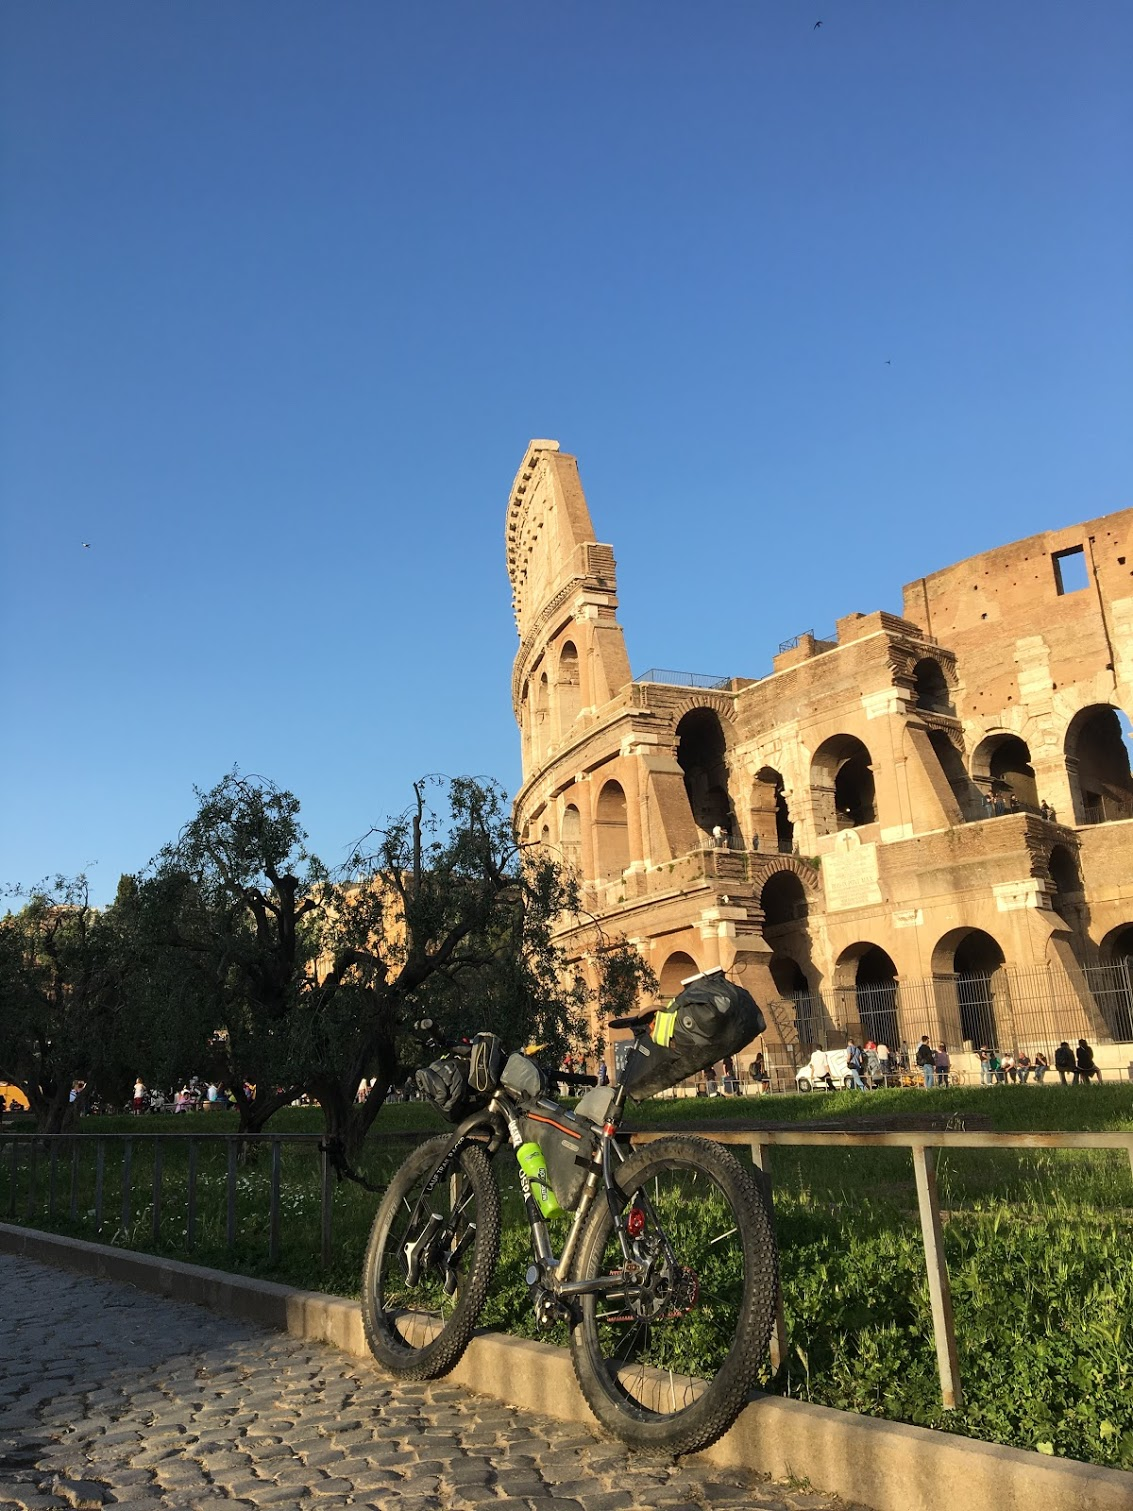 OSPA-DIVIDE 2018-Day1-Rome-Coloseo8.JPG